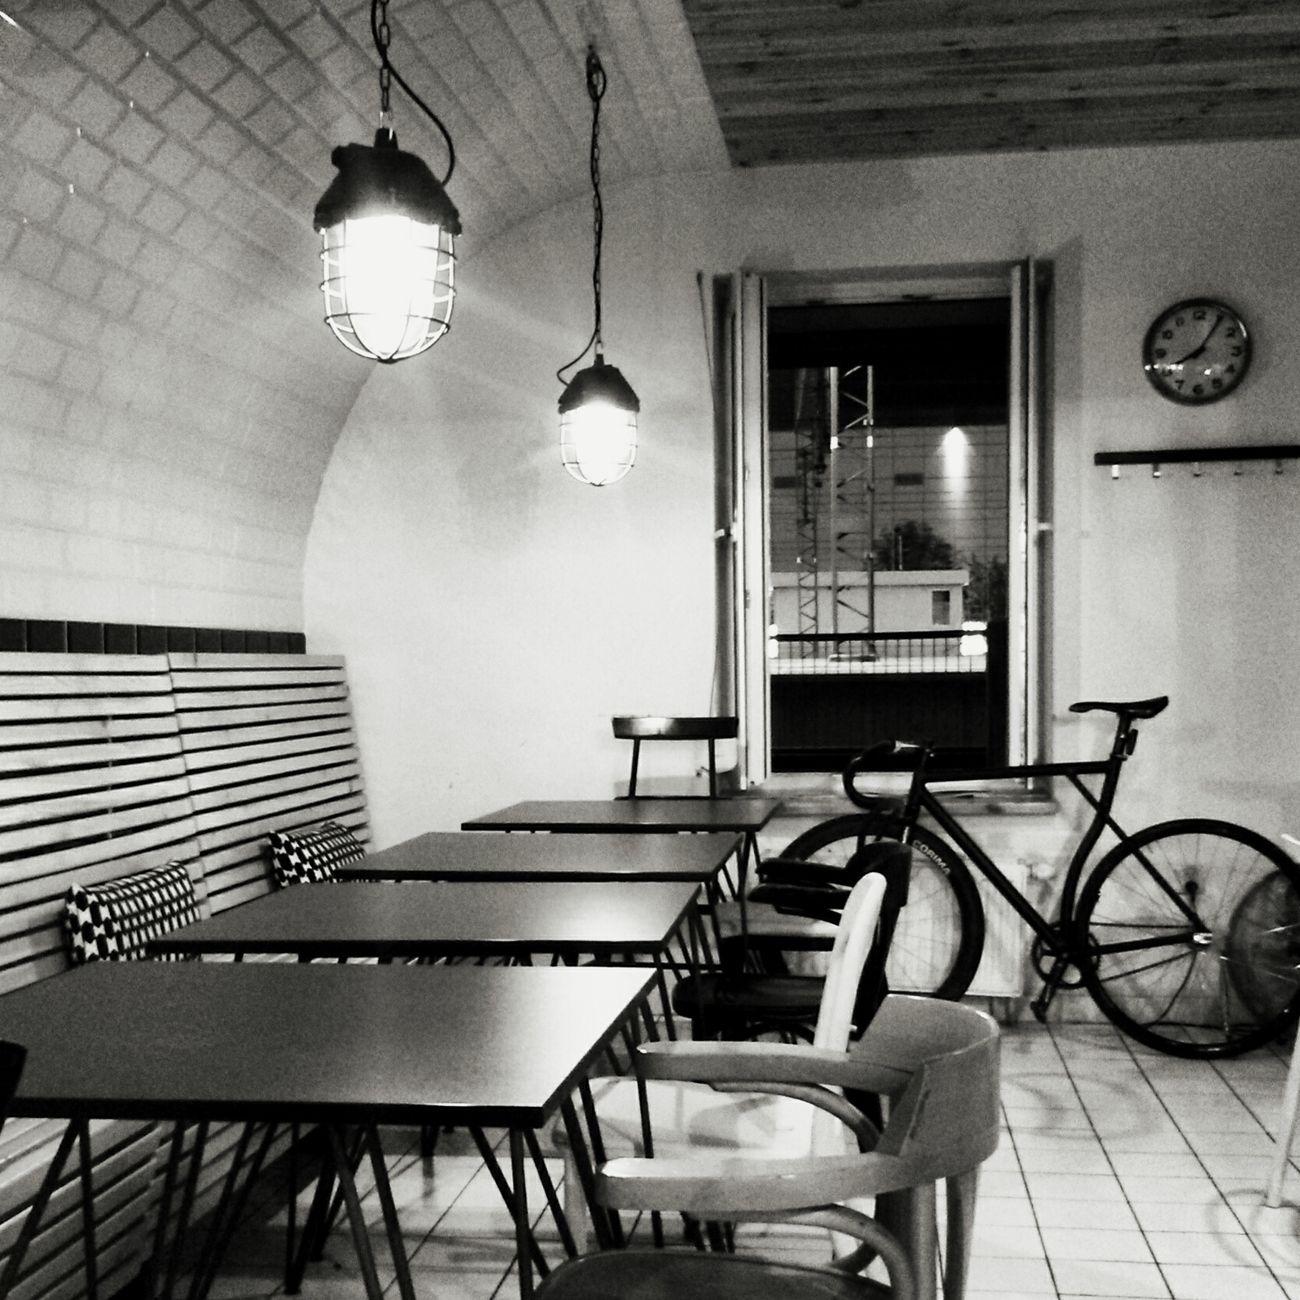 Urban Lifestyle Katowice Banhof Blackandwhite Bw Lovebikes Weekend